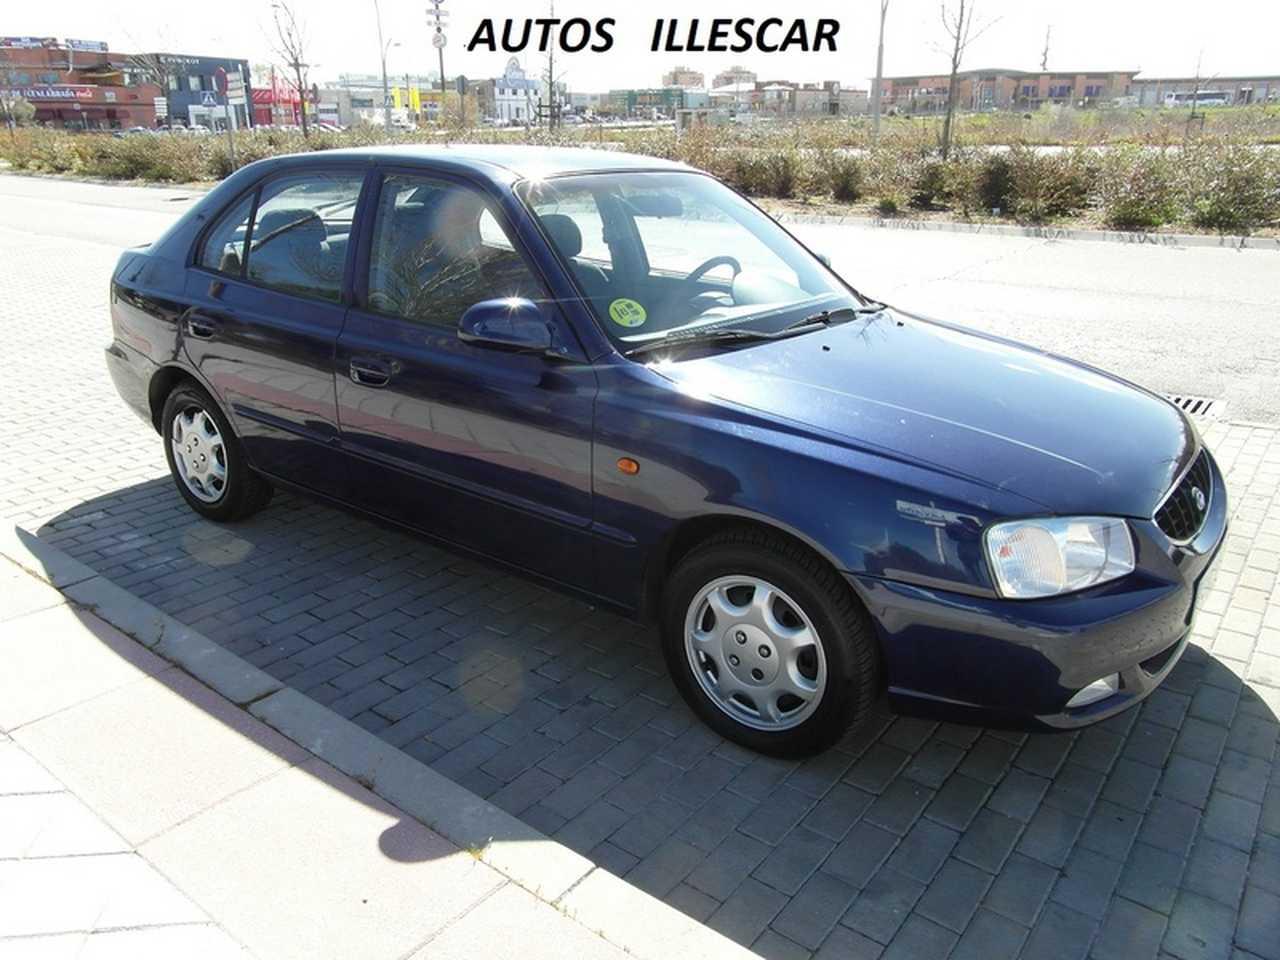 Hyundai Accent 1.5  100 CV MUY CUIDADO  - Foto 1